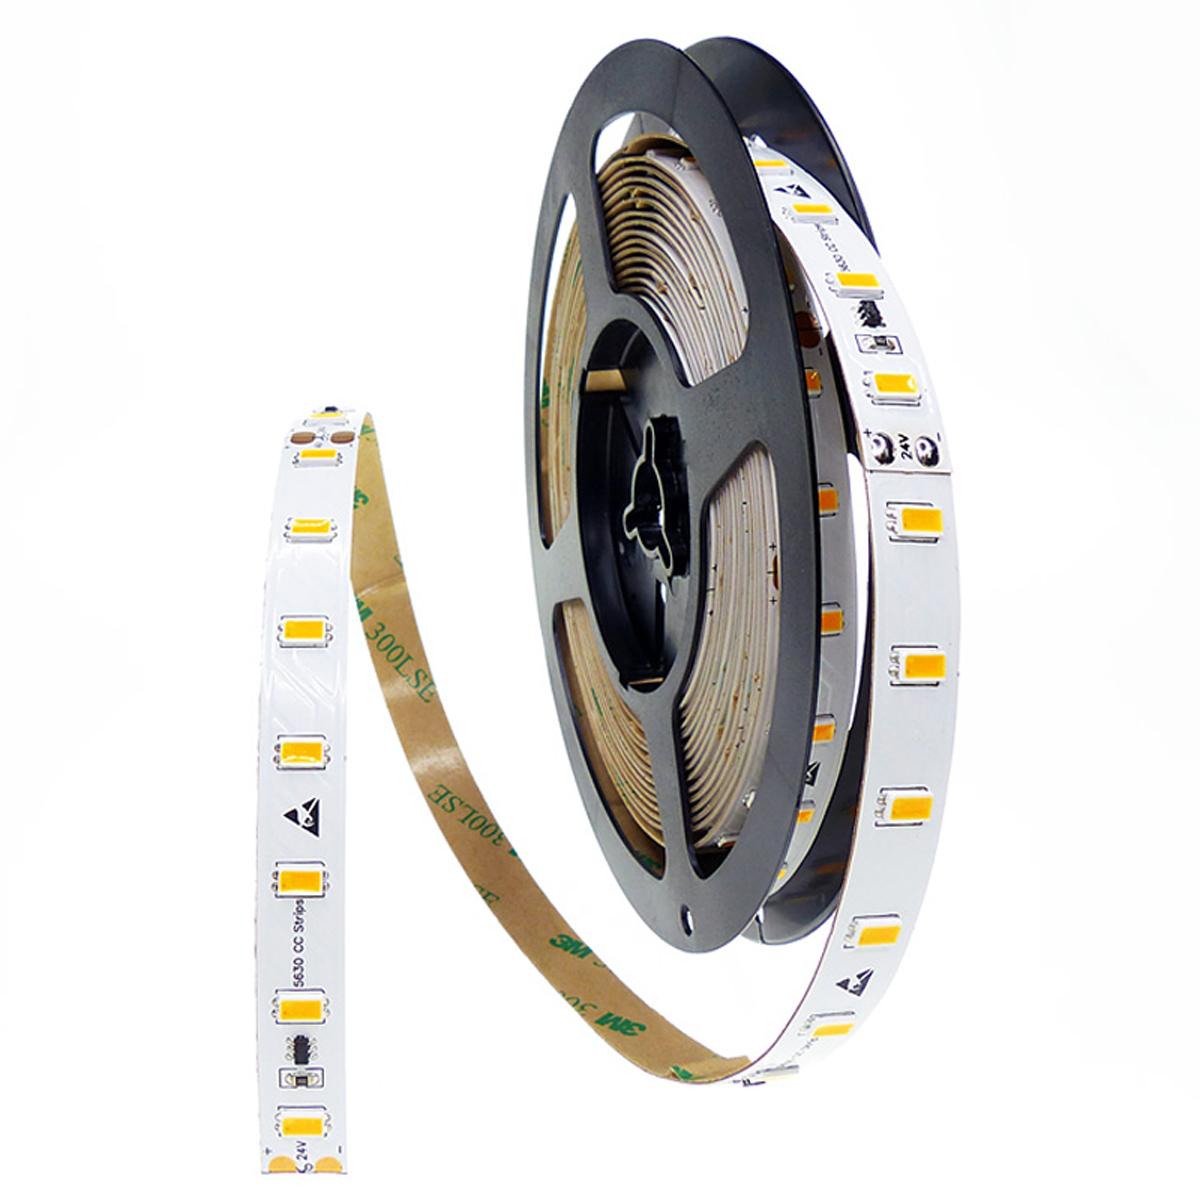 LED-STREIFEN HIGH QUALITY 350 SAMSUNG LED 9000lm//5m warm white 2700K A 5m Rolle